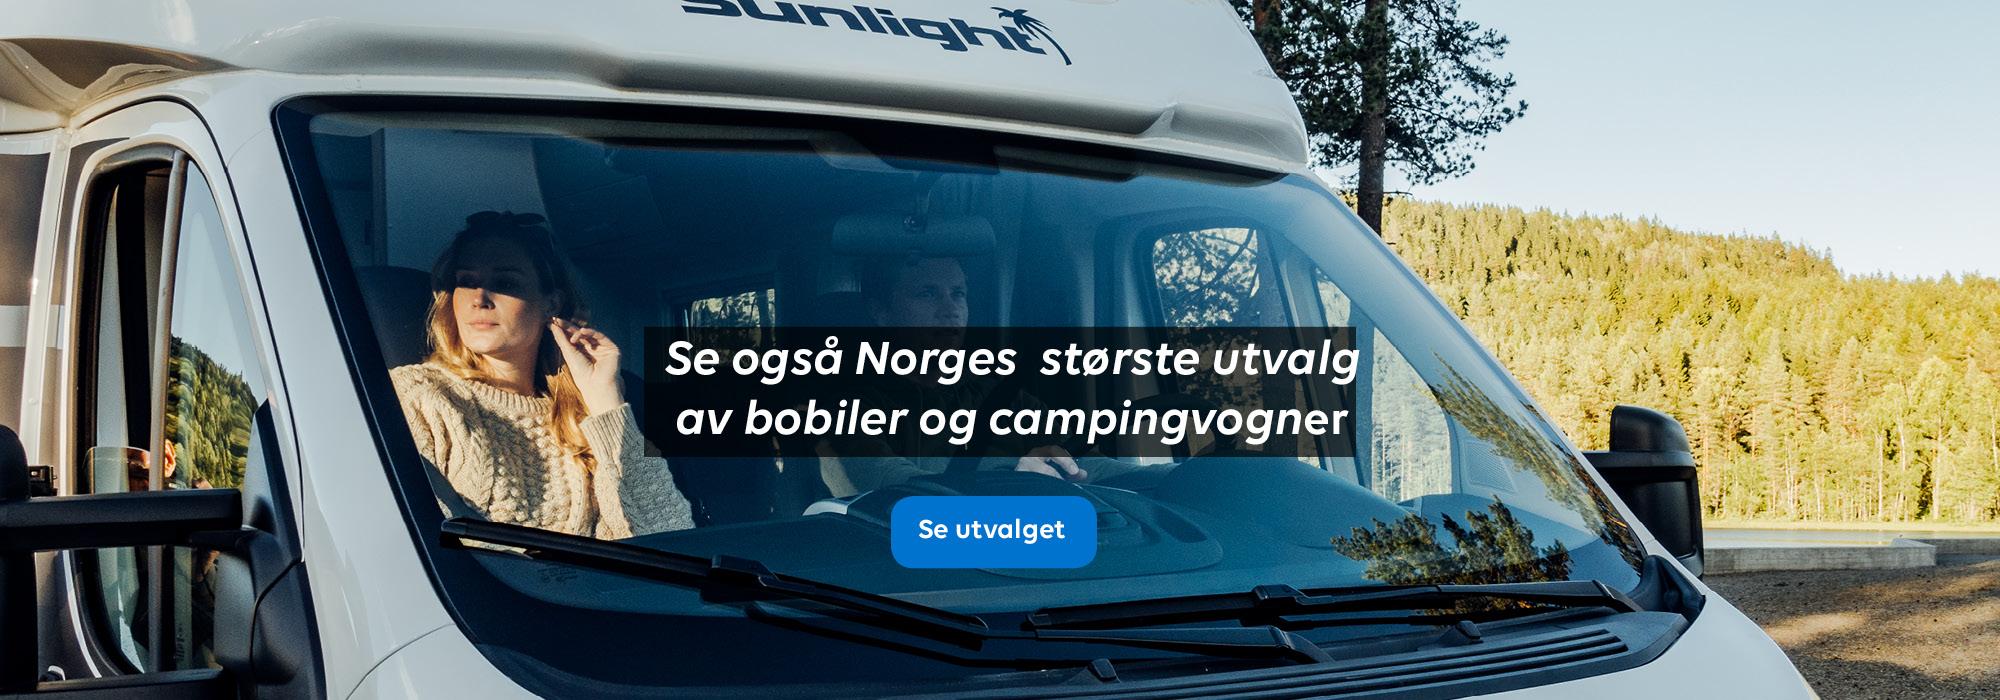 Sommerkampanje  Ferda